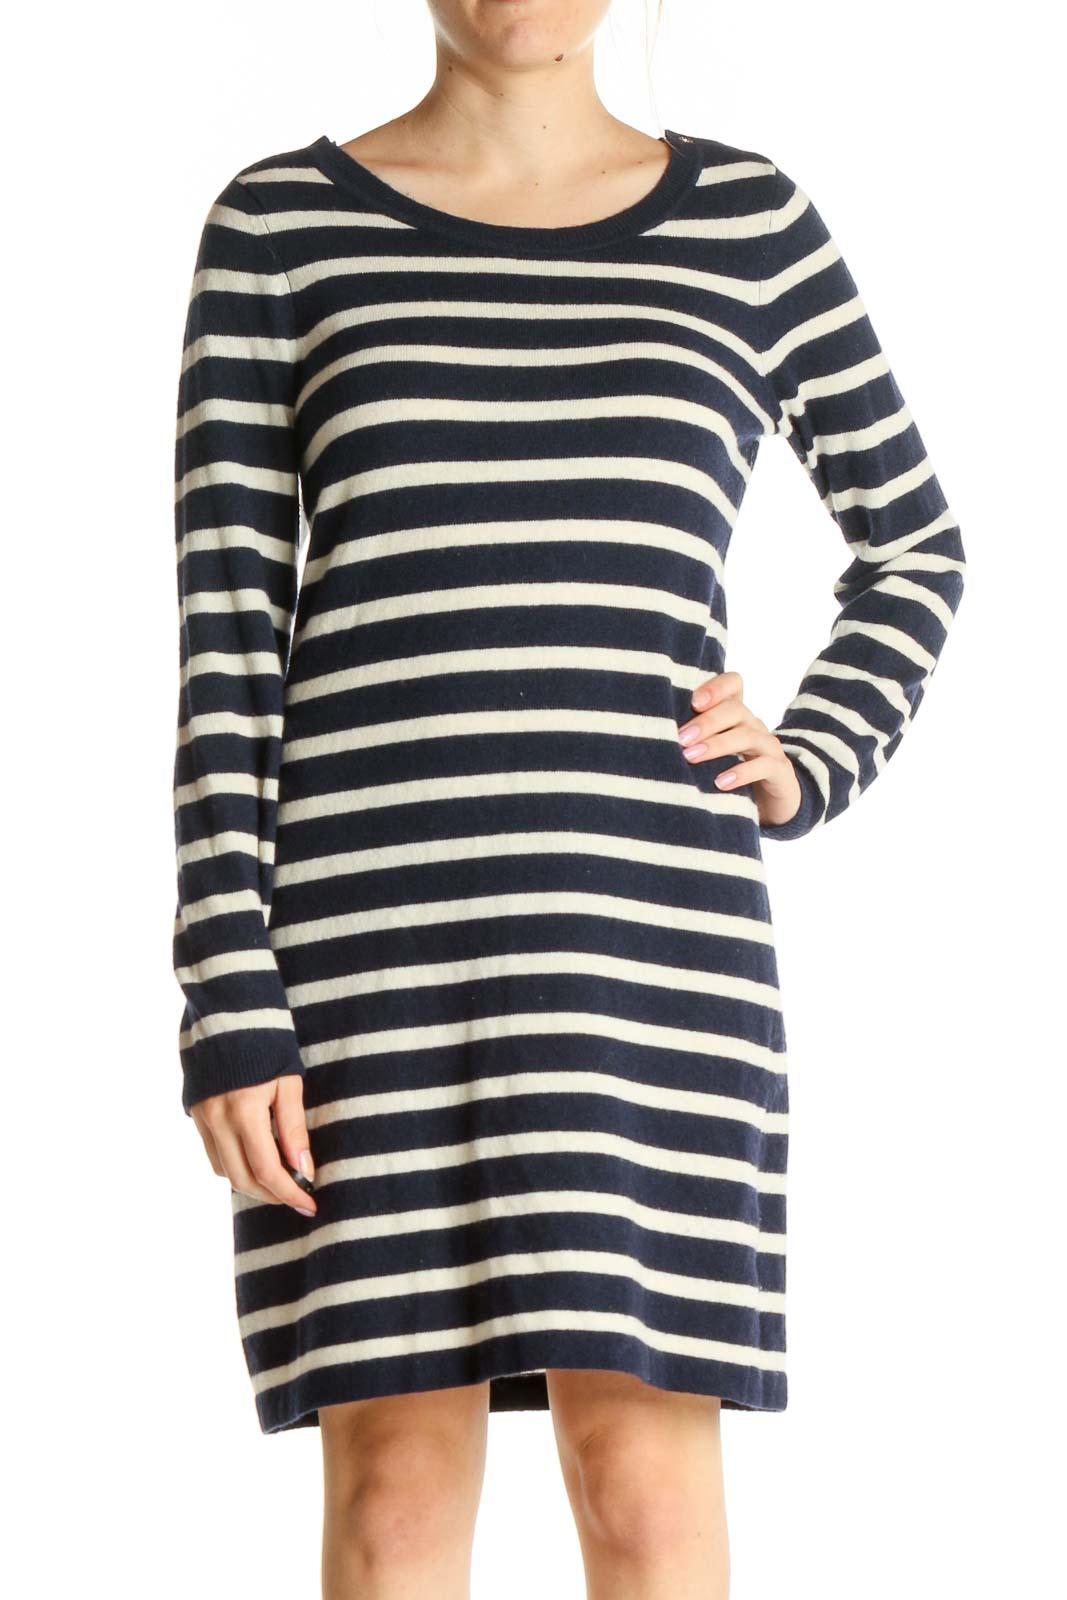 Beige Striped Day Sheath Dress Front